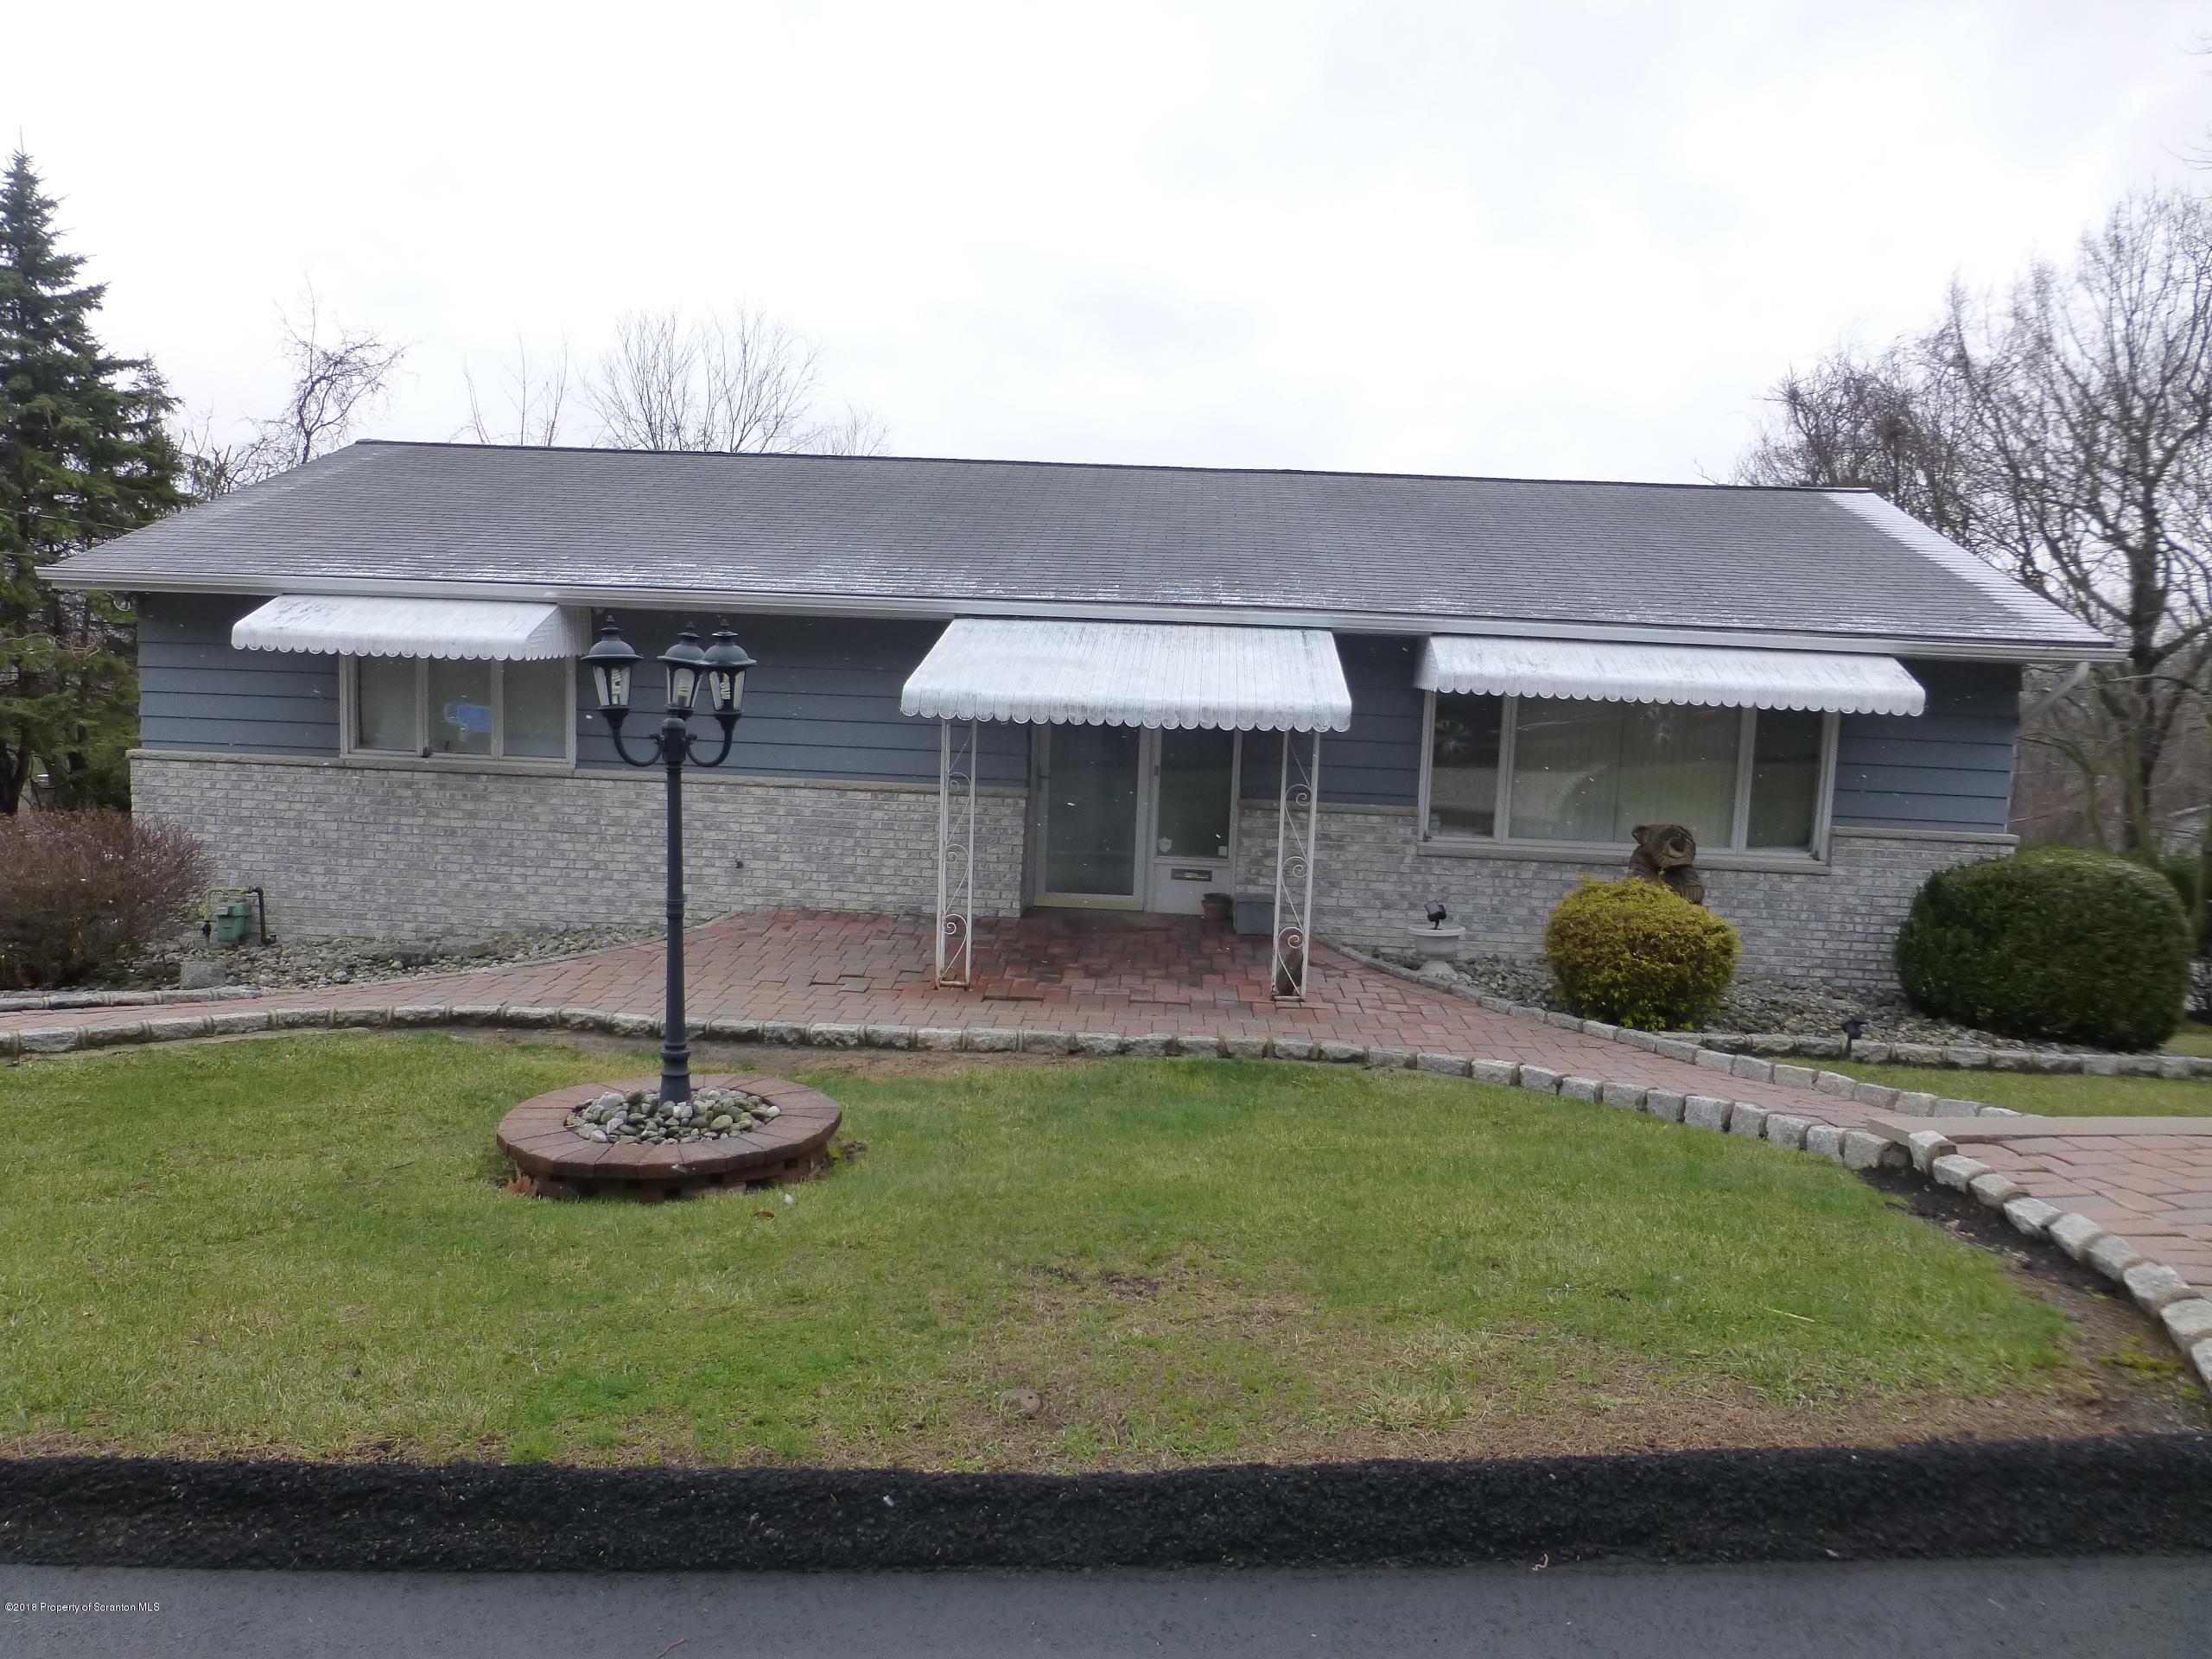 23 Leslie Dr, Scranton, Pennsylvania 18505, 2 Bedrooms Bedrooms, 5 Rooms Rooms,2 BathroomsBathrooms,Single Family,For Sale,Leslie,18-5673